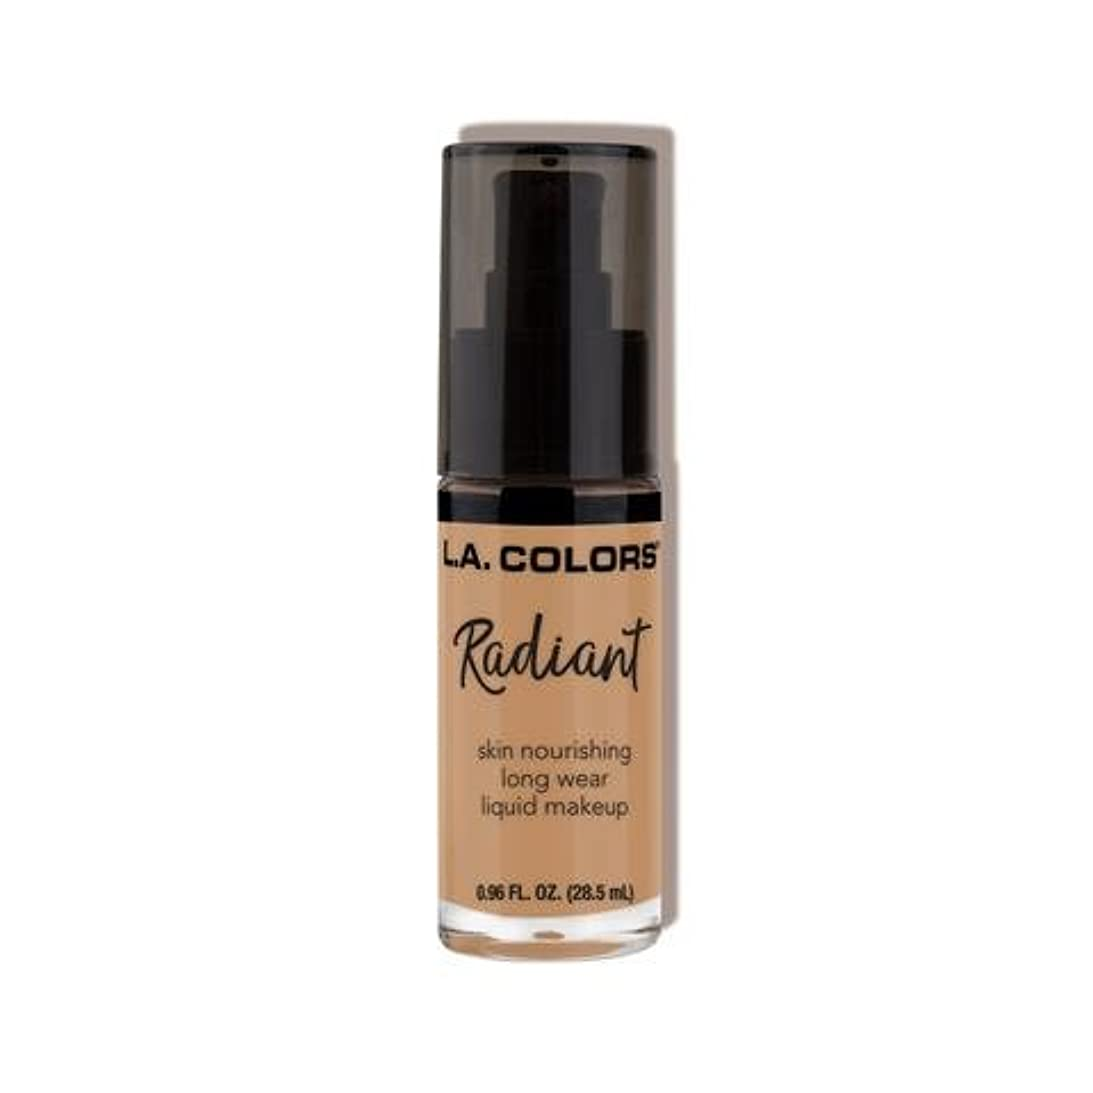 漏斗食欲学部(6 Pack) L.A. COLORS Radiant Liquid Makeup - Light Toffee (並行輸入品)